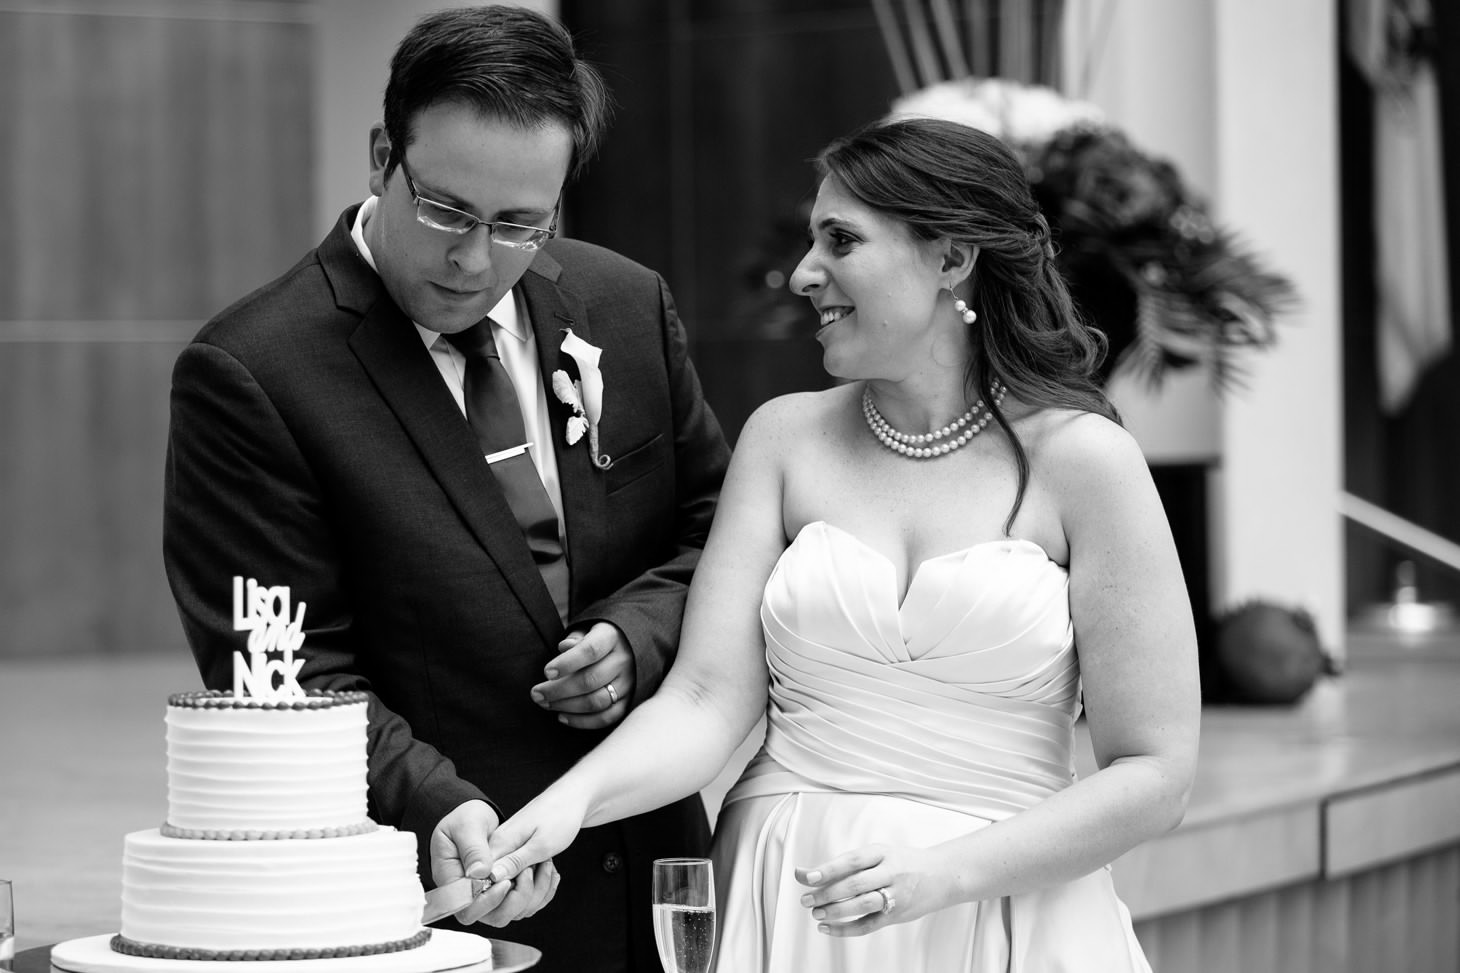 061-nyc-wedding-photographer-hoboken-waterfront-wedding-photos-smitten-chickens.jpg